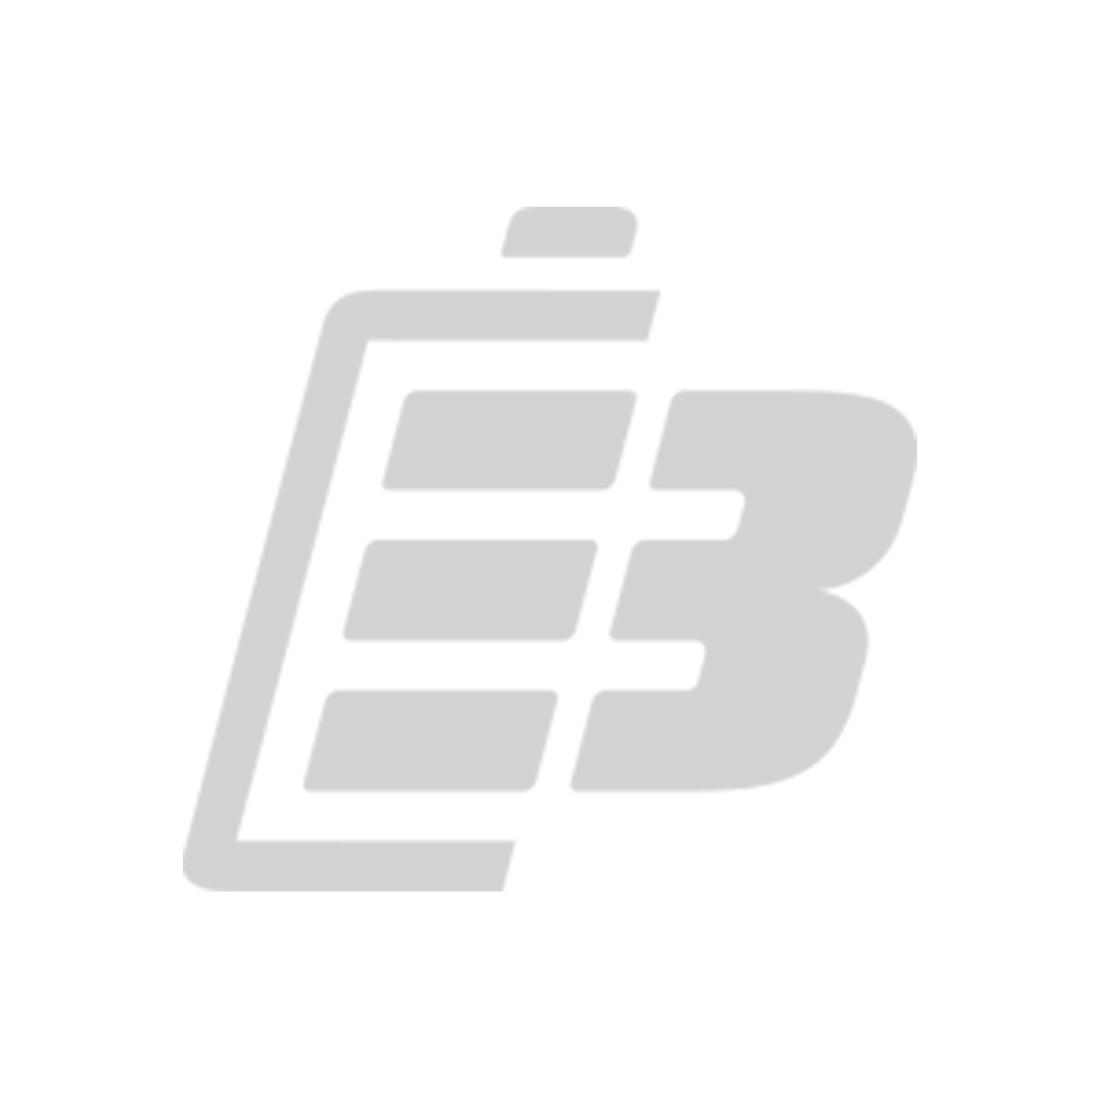 321 Energizer button Battery 1